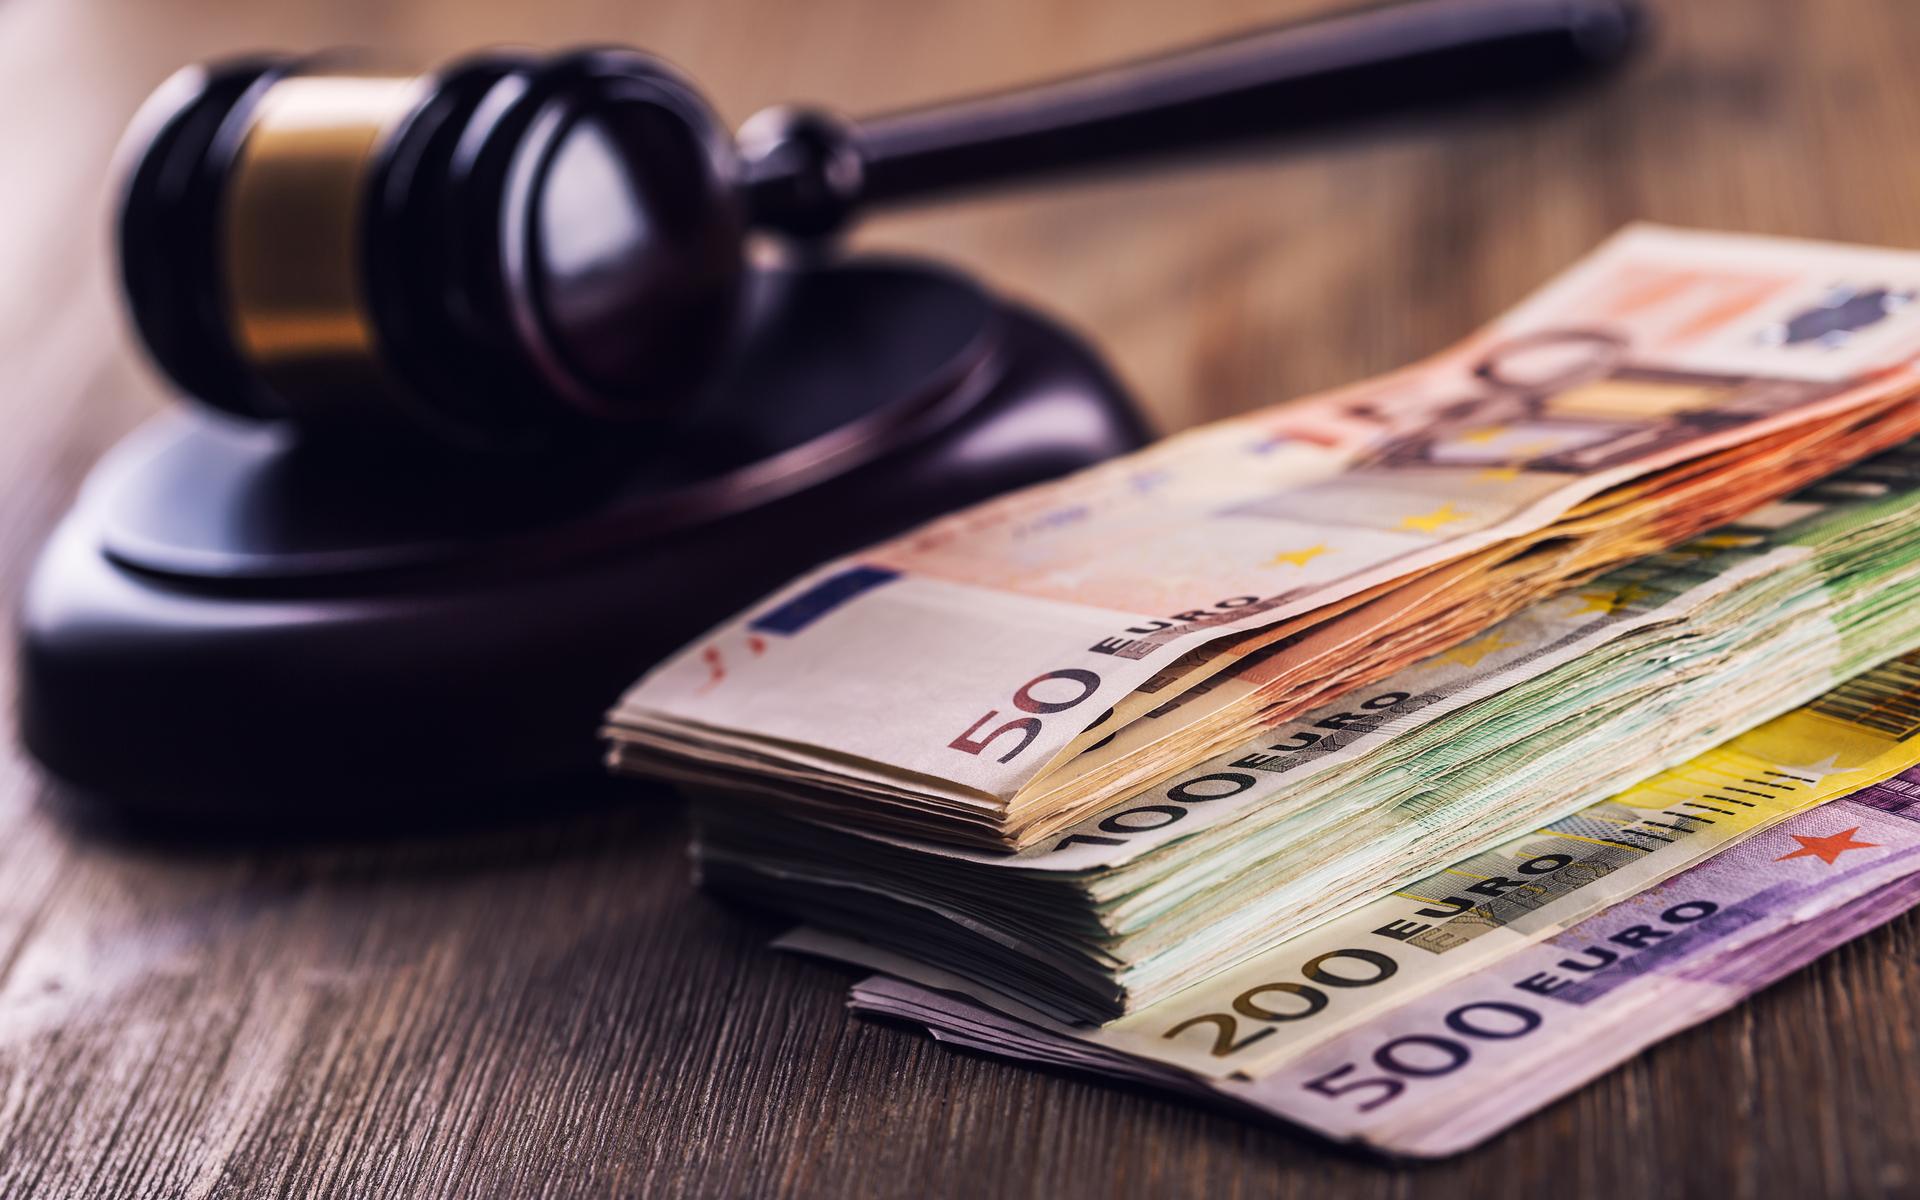 Austria: Crypto Firms Face €200K Fine Under New AML Directive